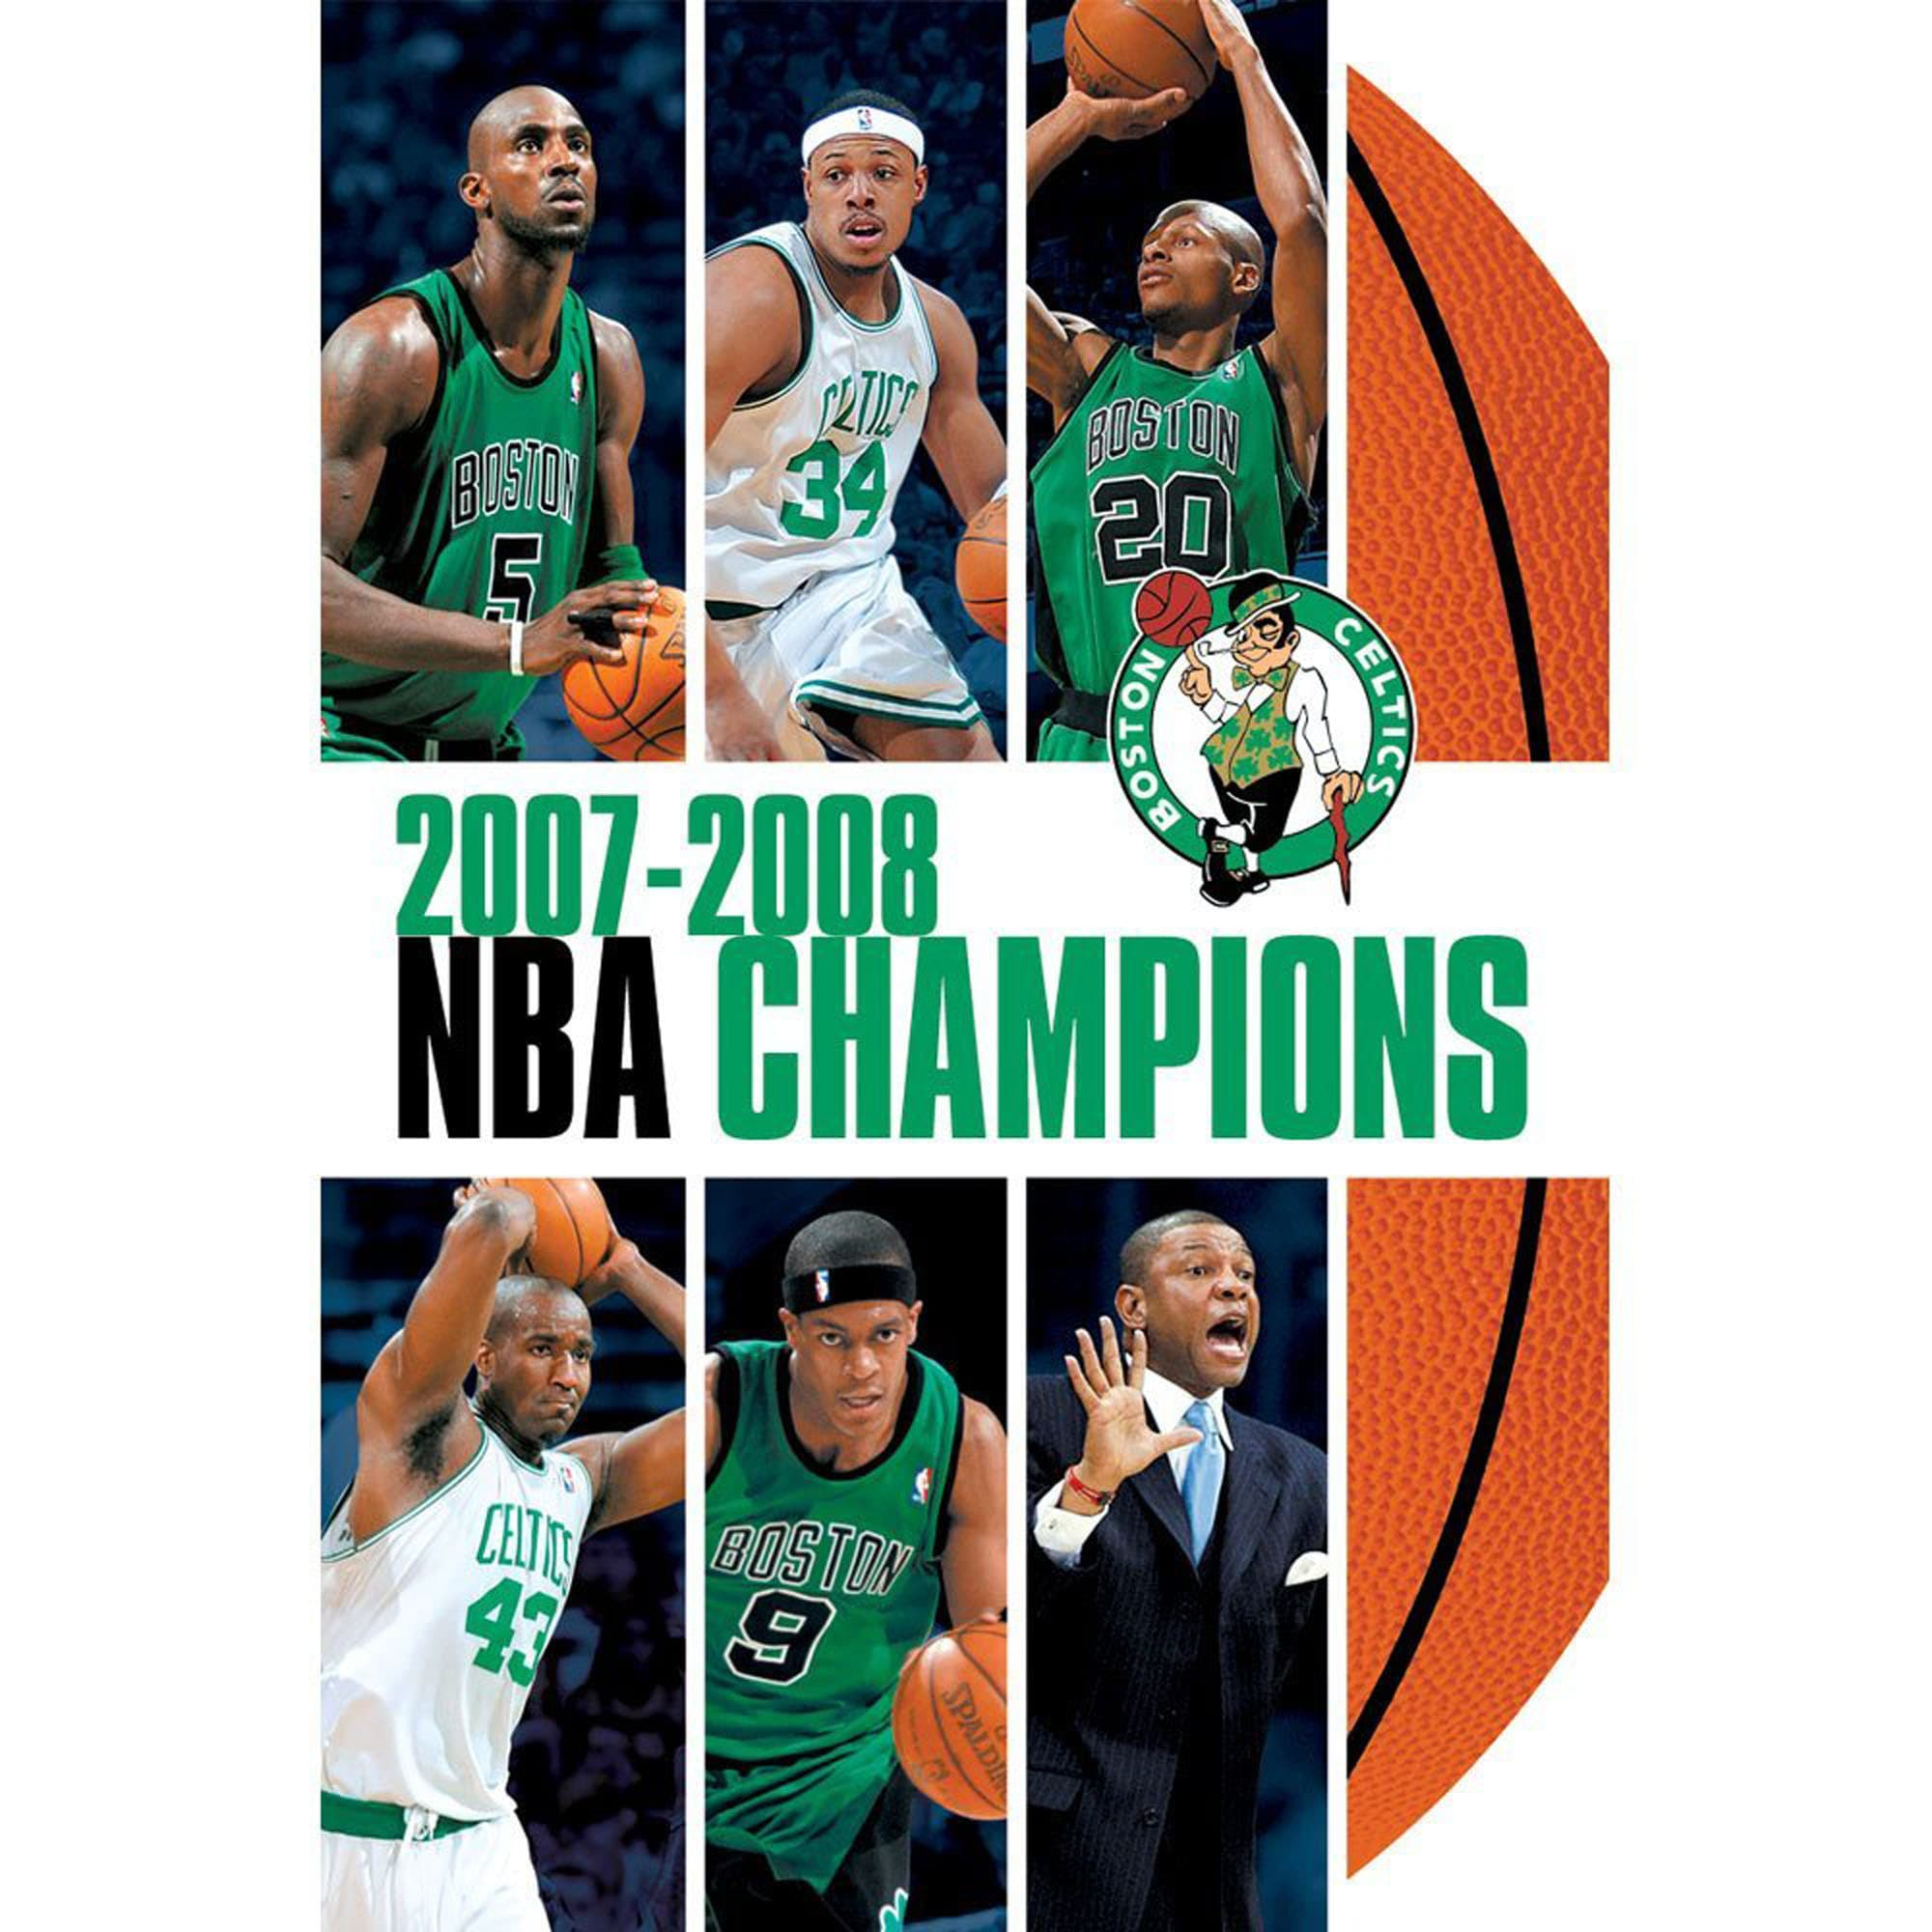 Boston Celtics 2008 NBA Champions DVD